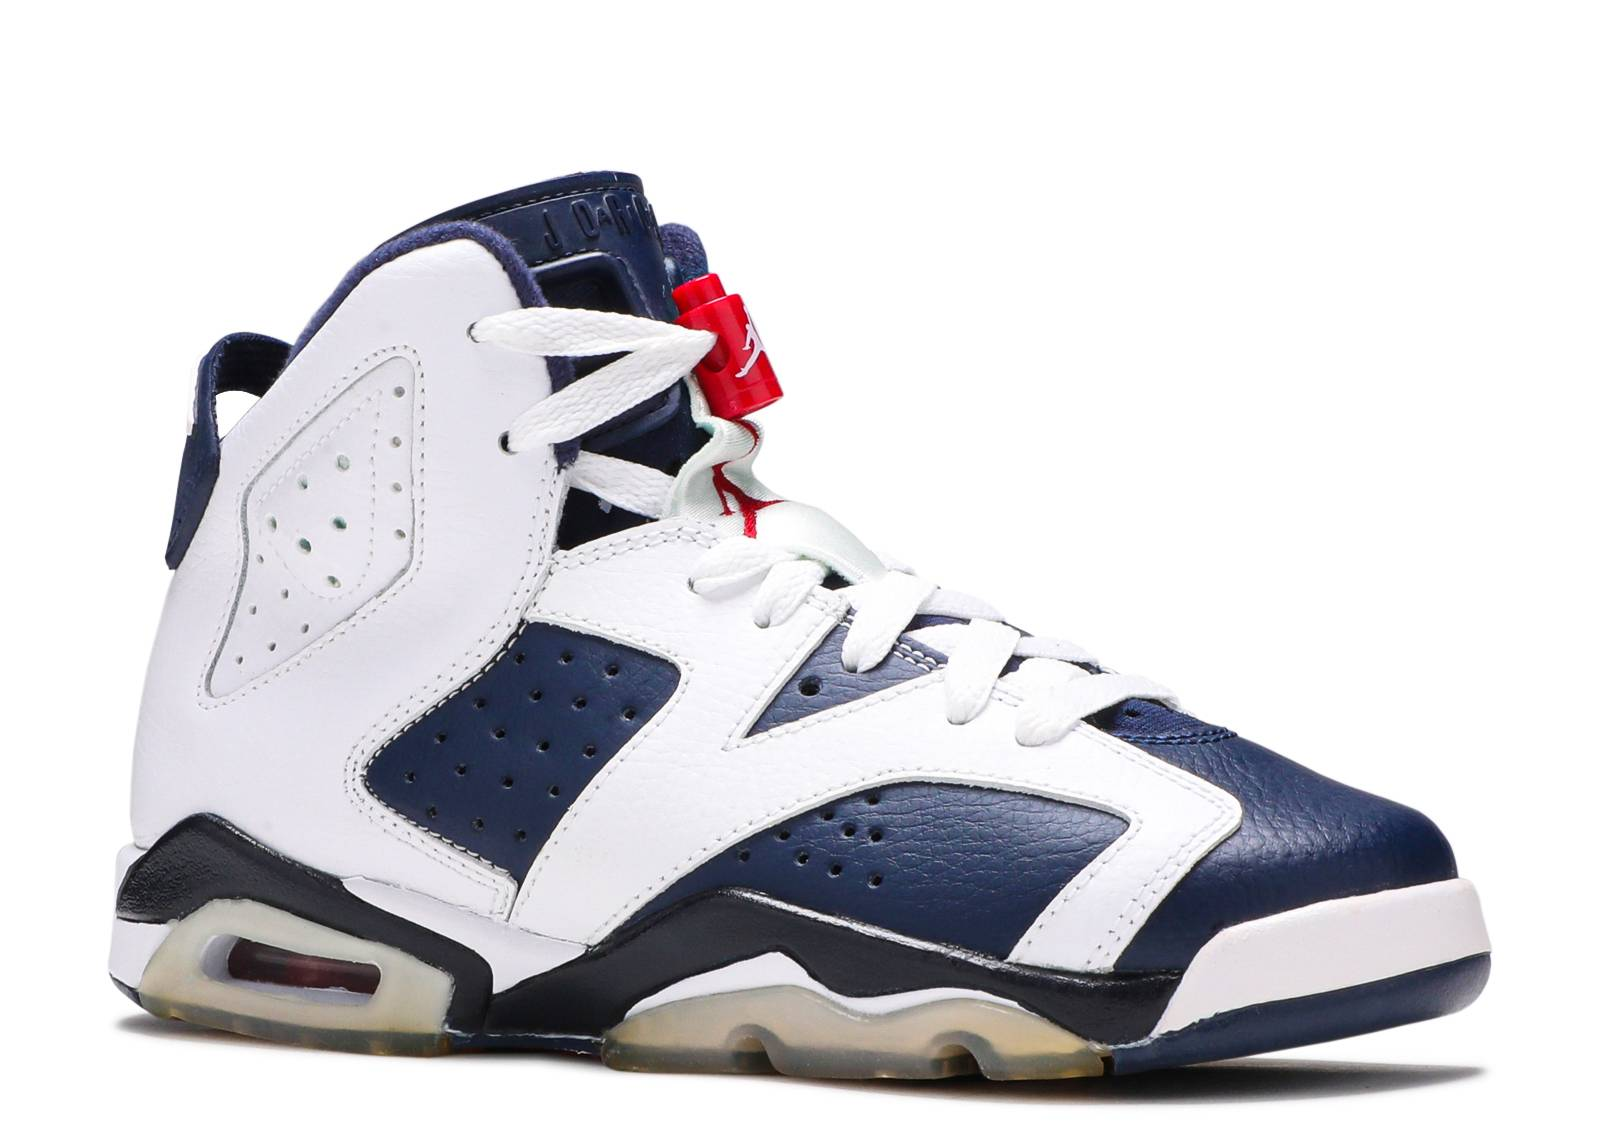 Air Jordan 6 Retro (gs) 'Olympic 2012 Release' - 384665-130 - Size 4.5 fIvrKoDME3